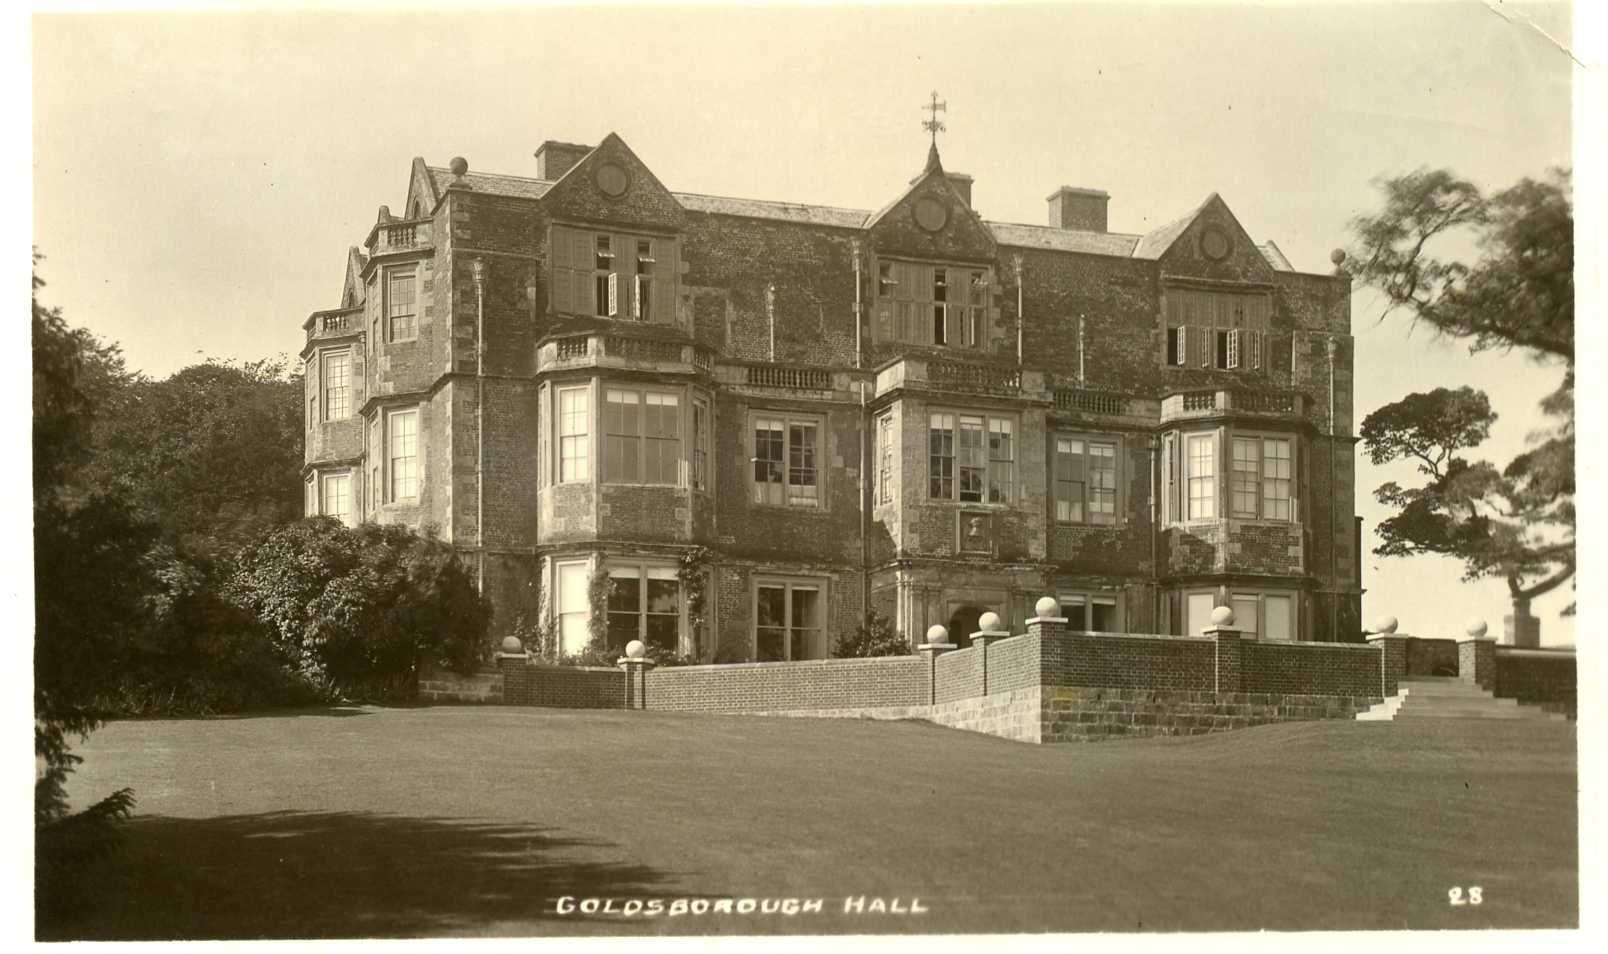 Pin On Goldsborough Hall S Royal History